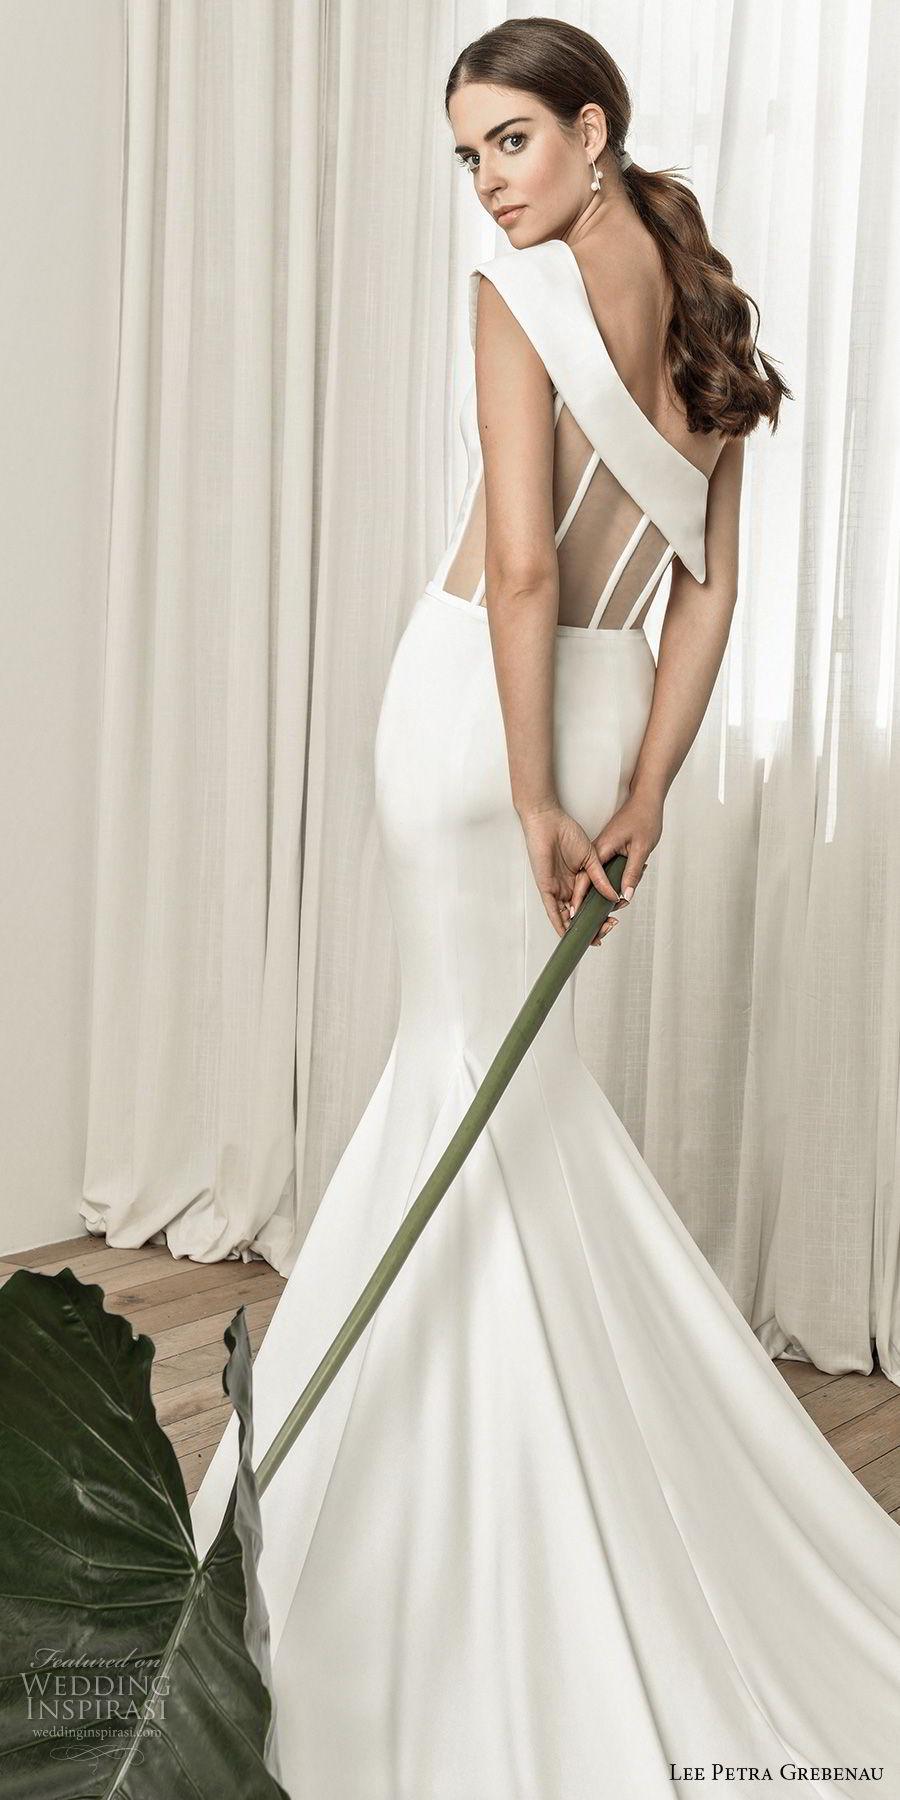 lee petra grebenau pre 2019 bridal asymmetrical neckline simple clean elegant fit and flare wedding dress chapel train (5) zbv